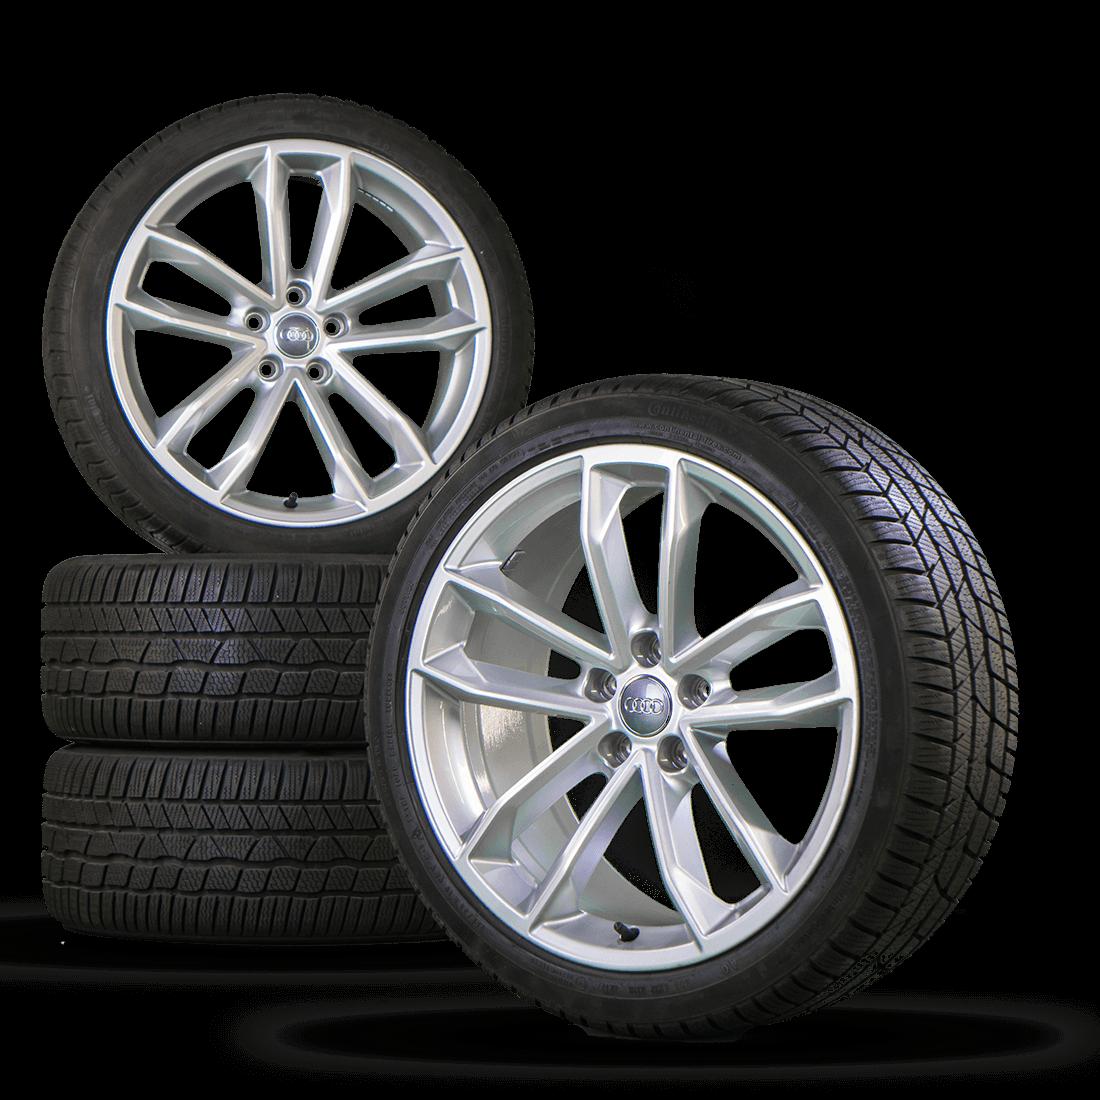 Audi 19 Inch Aluminum Rims A5 S5 8W B9 Rims Winter Tires